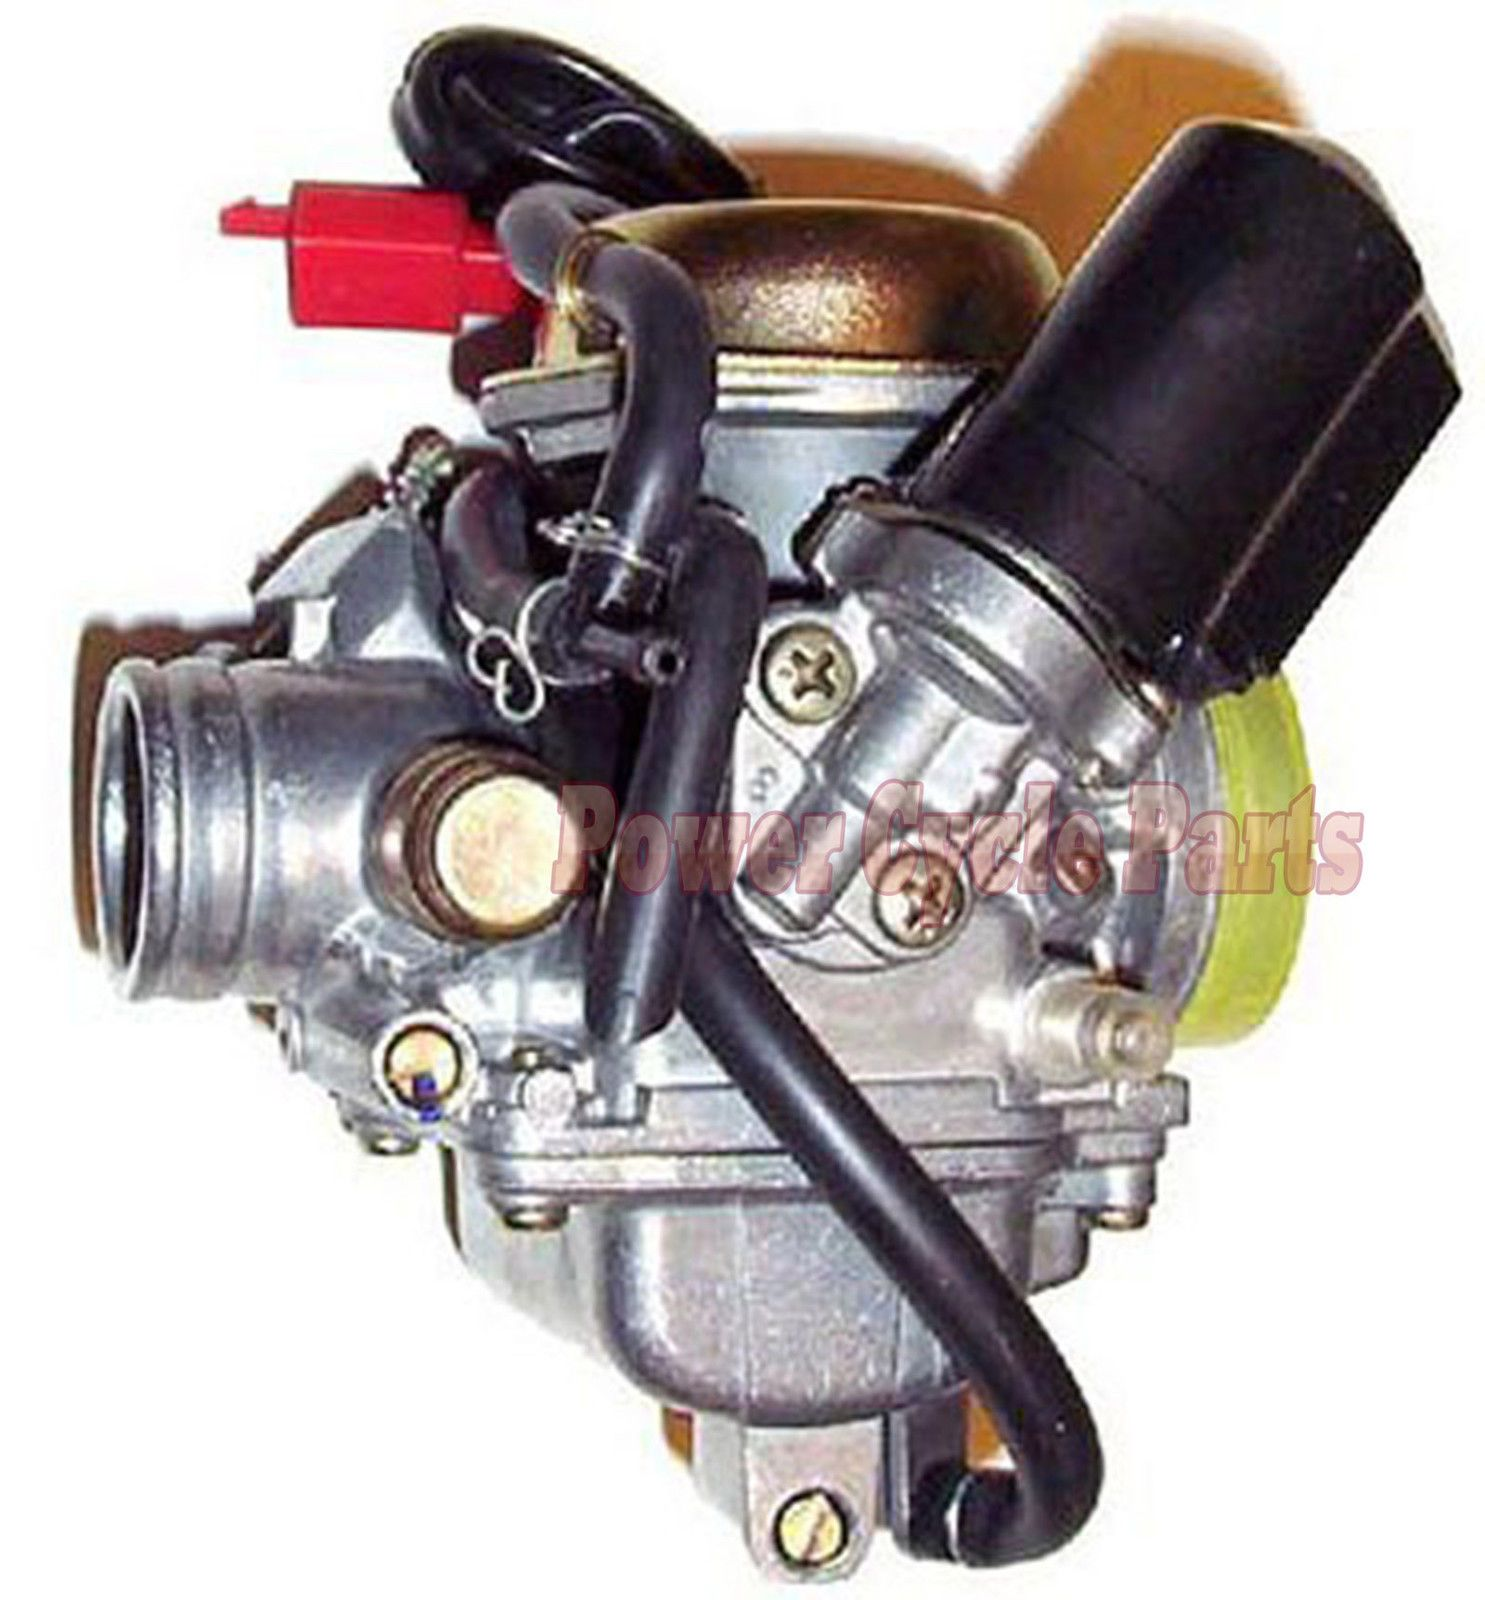 [DVZP_7254]   GY6 150CC COMPLETE CARBURETOR ROKETA LANCE TANK BMX ZNEN SUNL PD24J CARB  CHOKE   150cc, Carburetor, Fuel delivery   Znen 150cc Gy6 Ignition Wiring Diagram      Pinterest